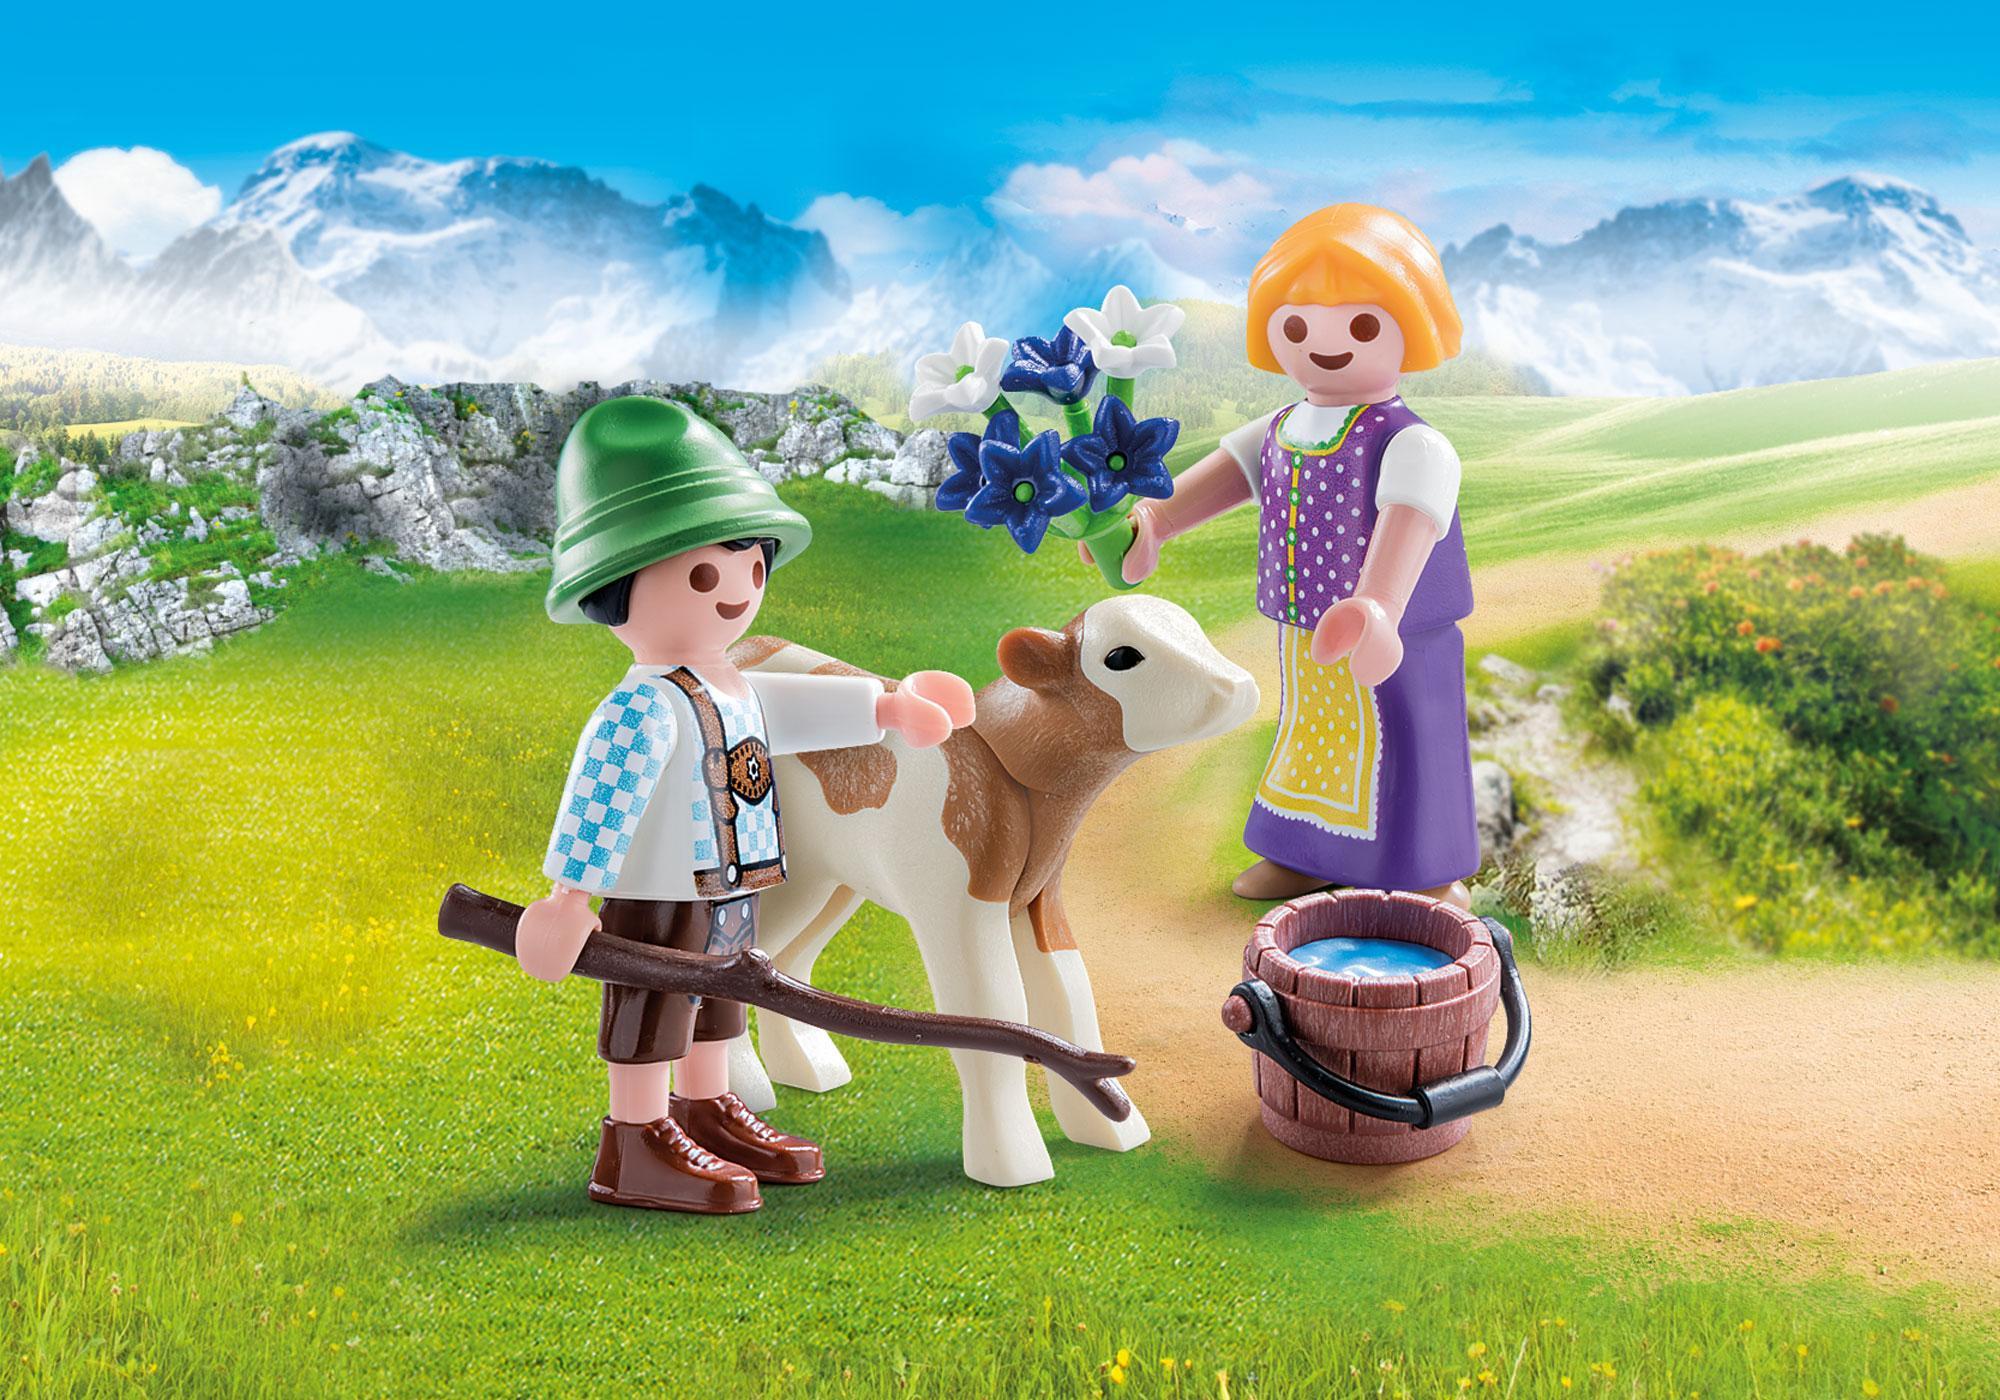 http://media.playmobil.com/i/playmobil/70155_product_detail/Kinder mit Kälbchen